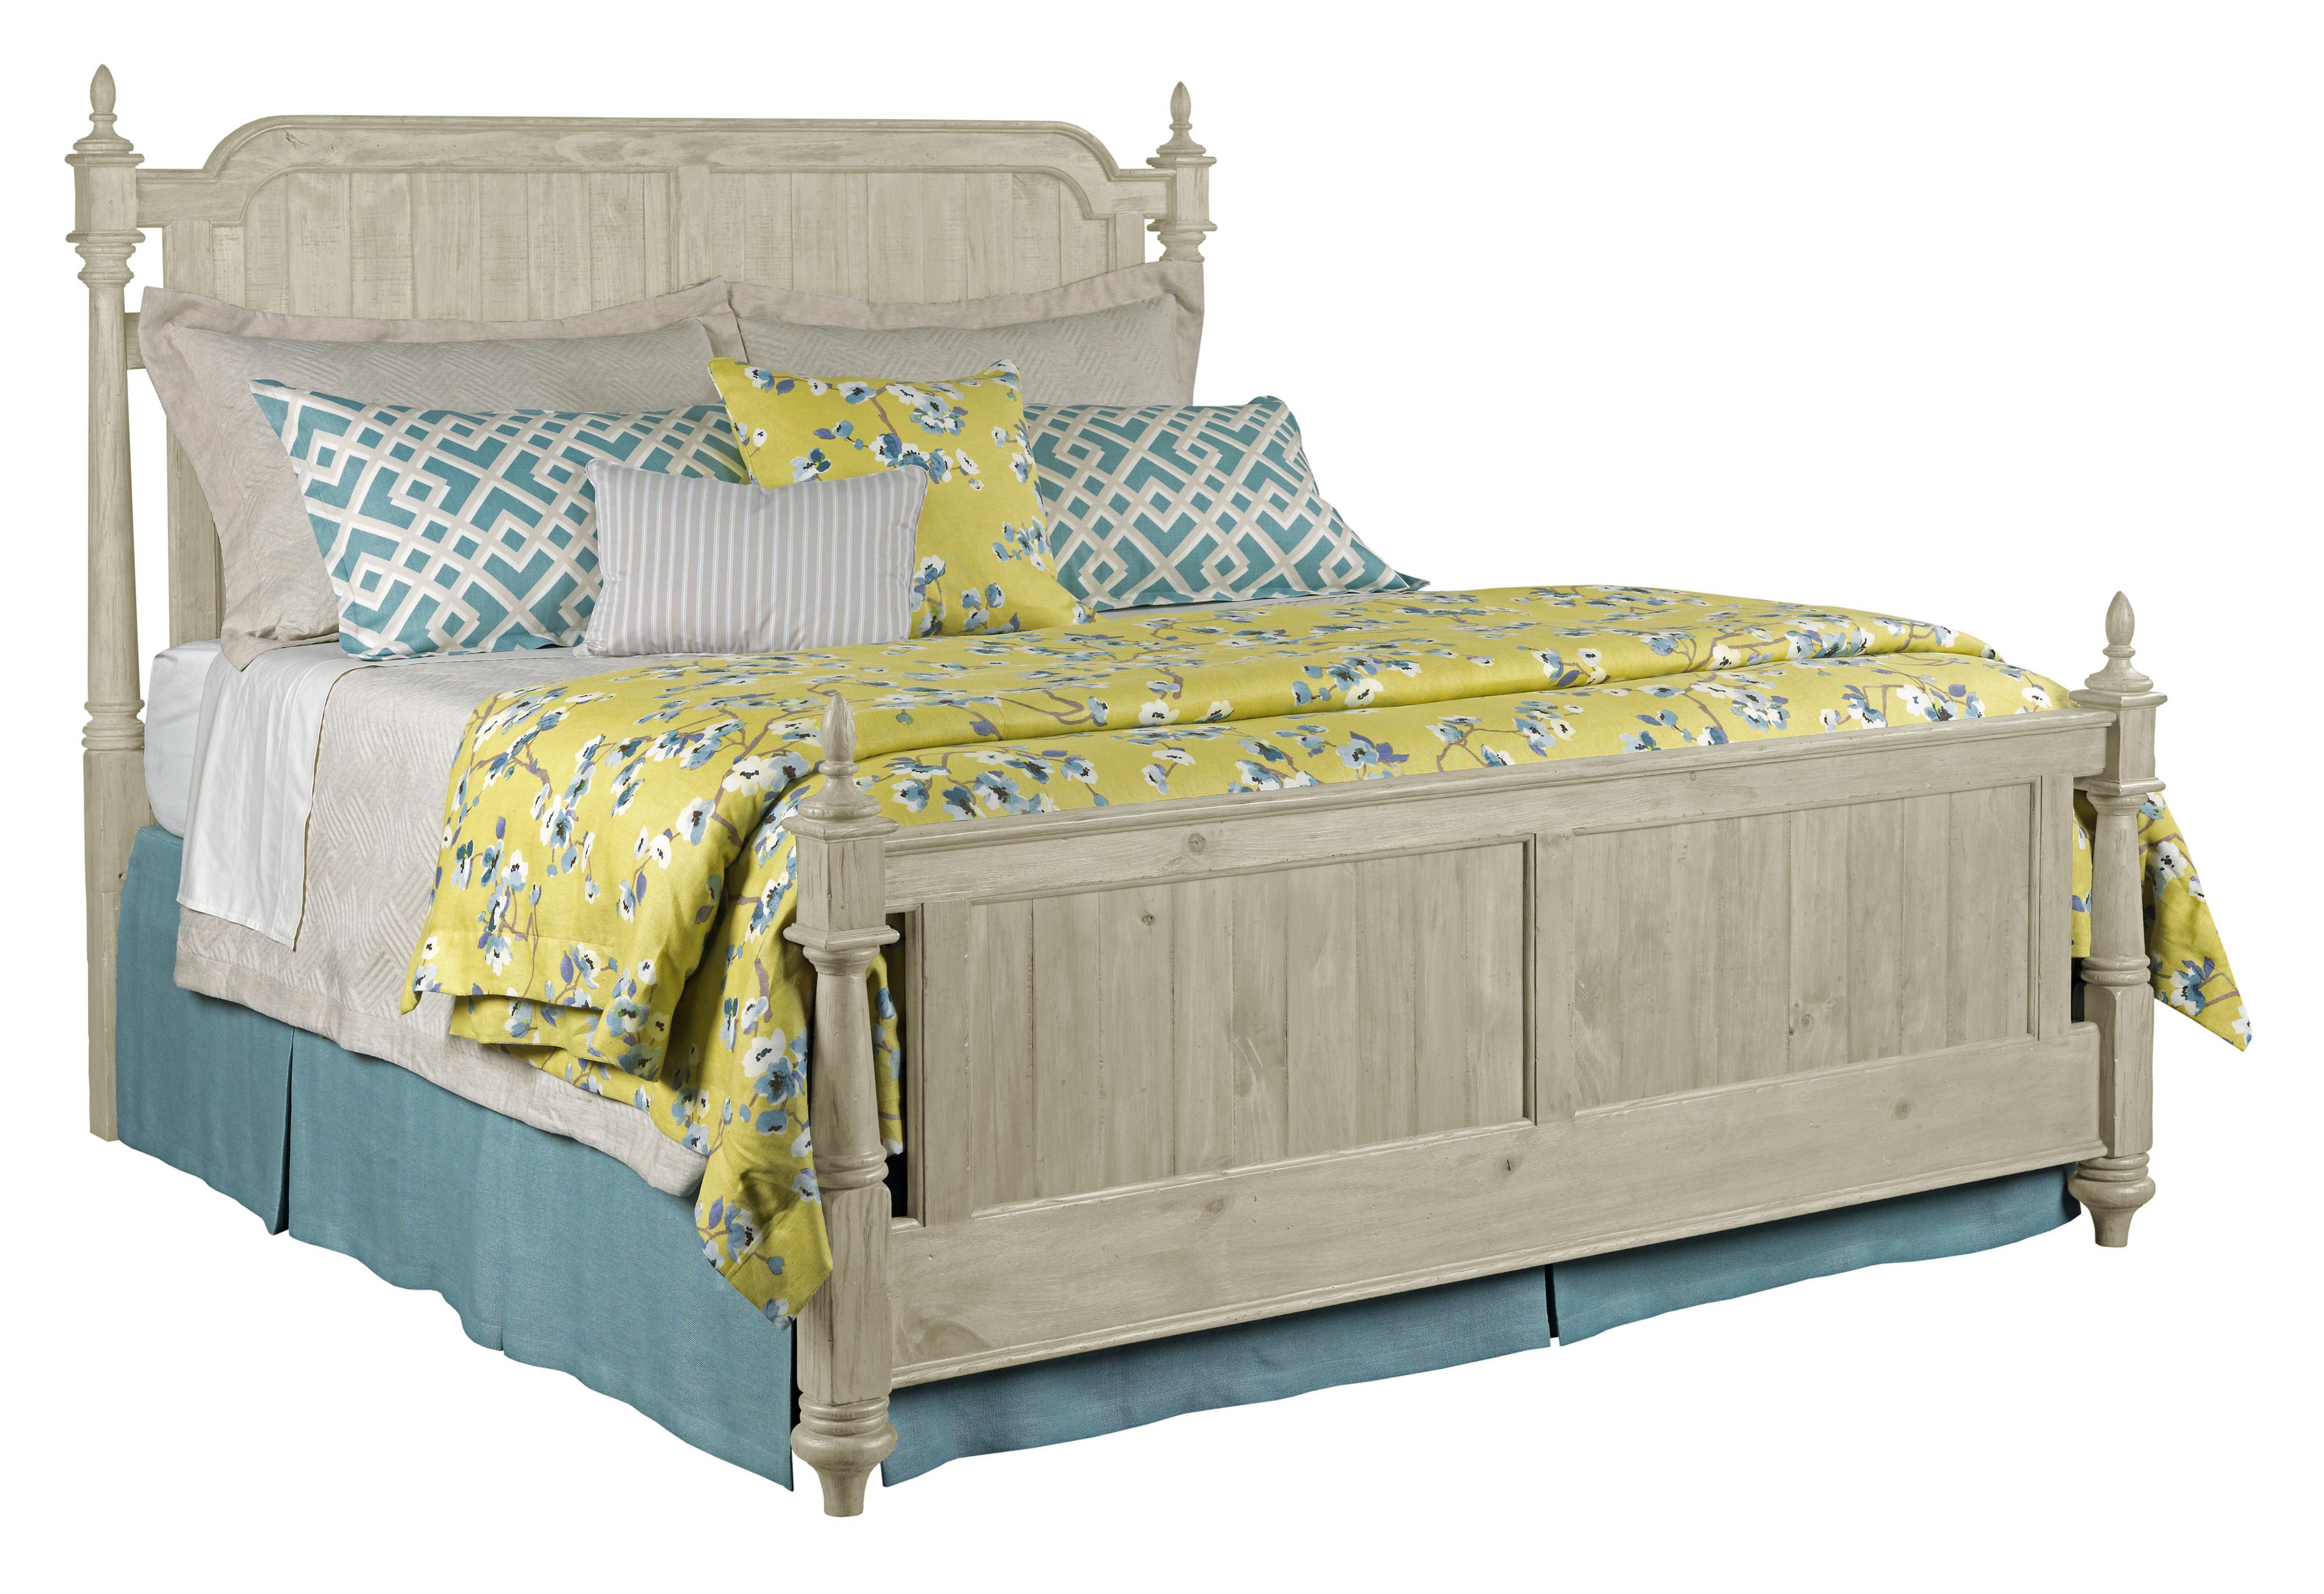 Kincaid Furniture Weatherford Westland King Bed Package - Item Number: 75-136P